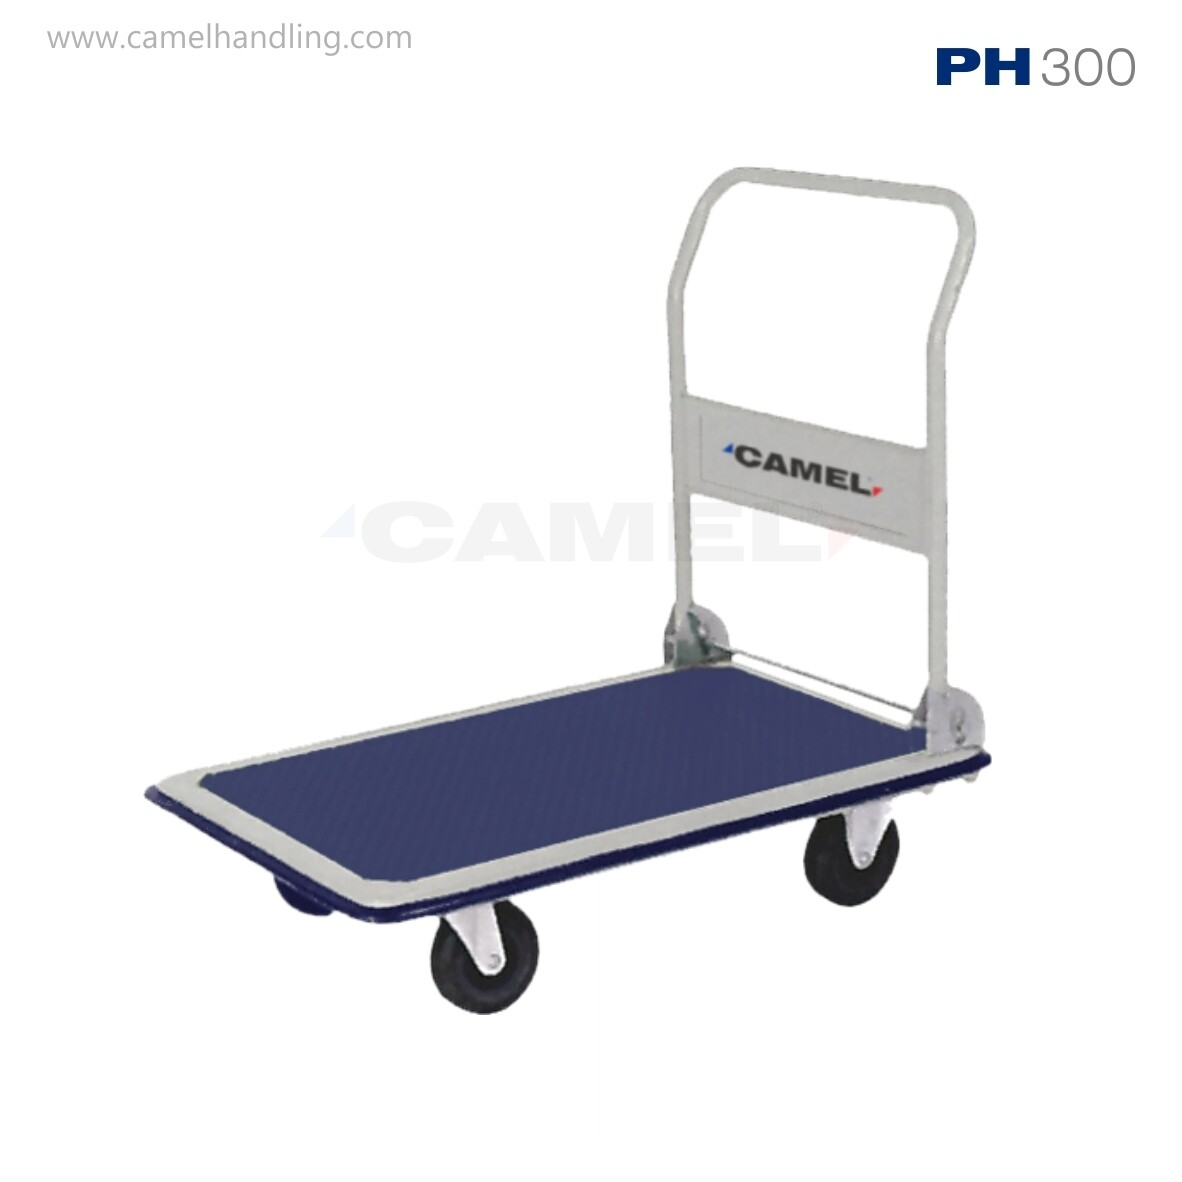 PH300